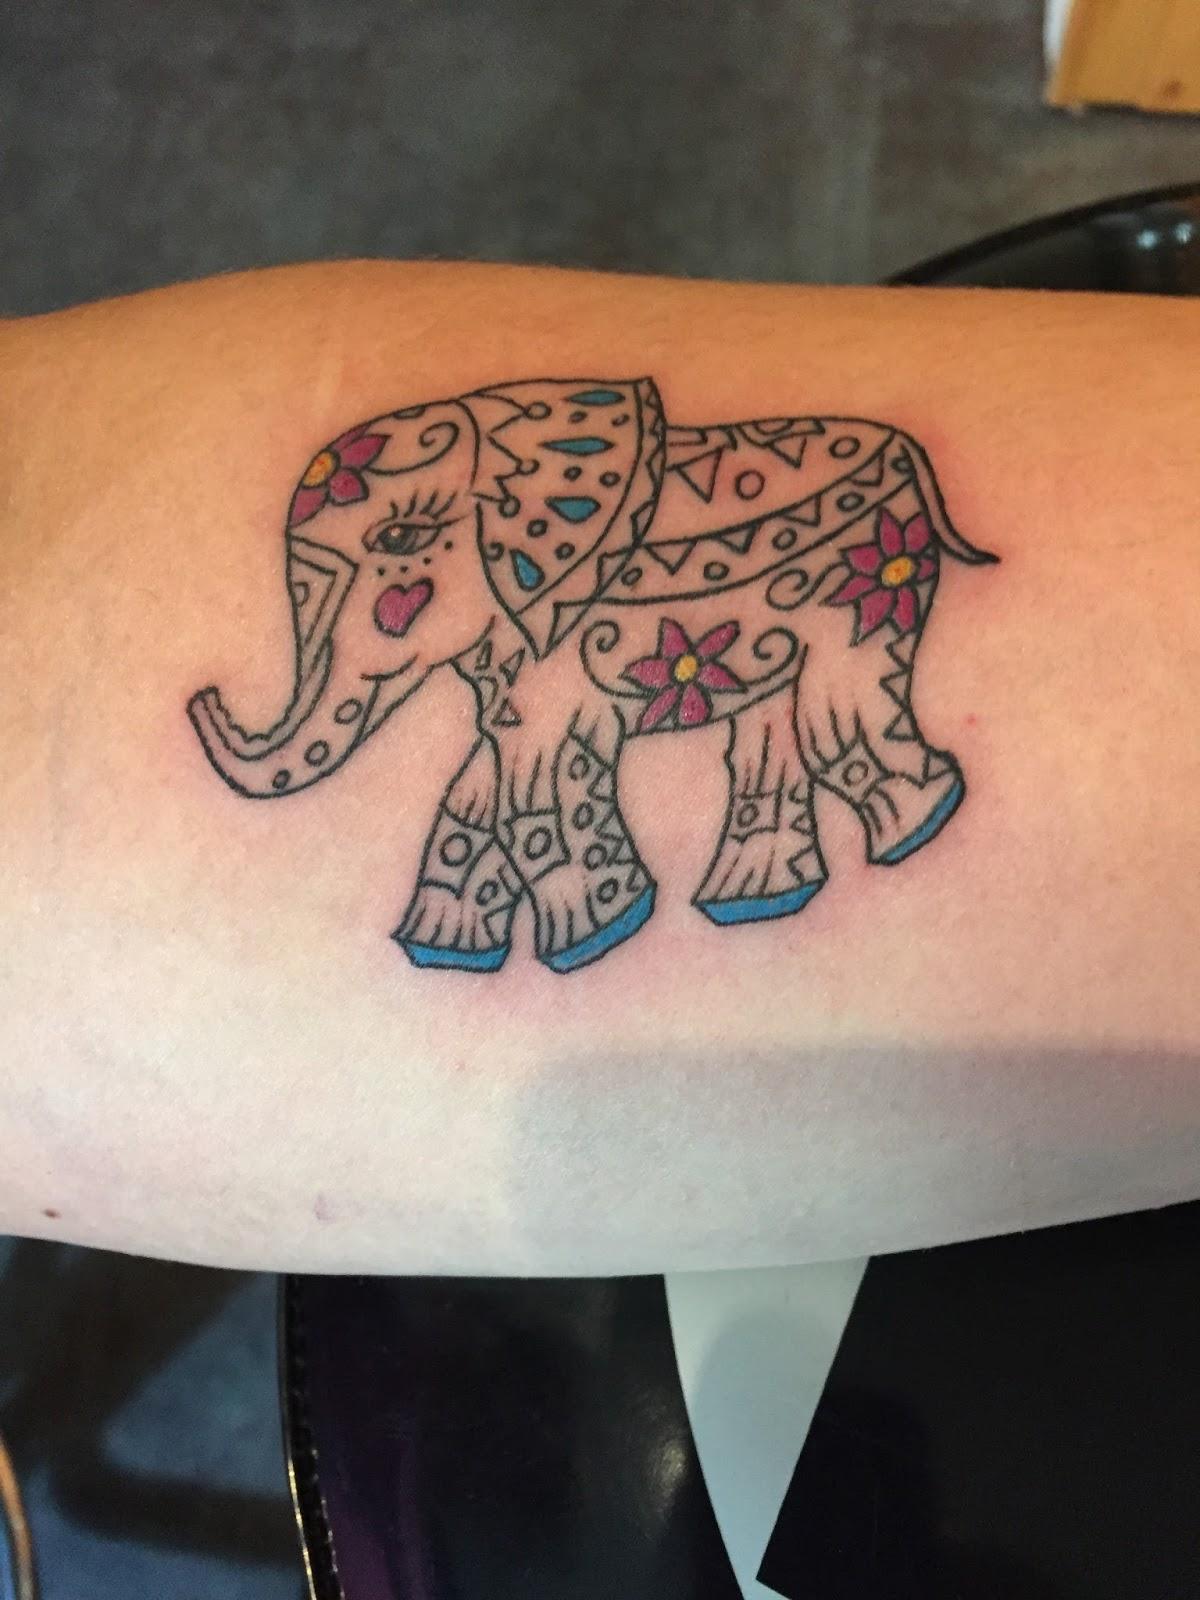 coming through skin tattoos gallery